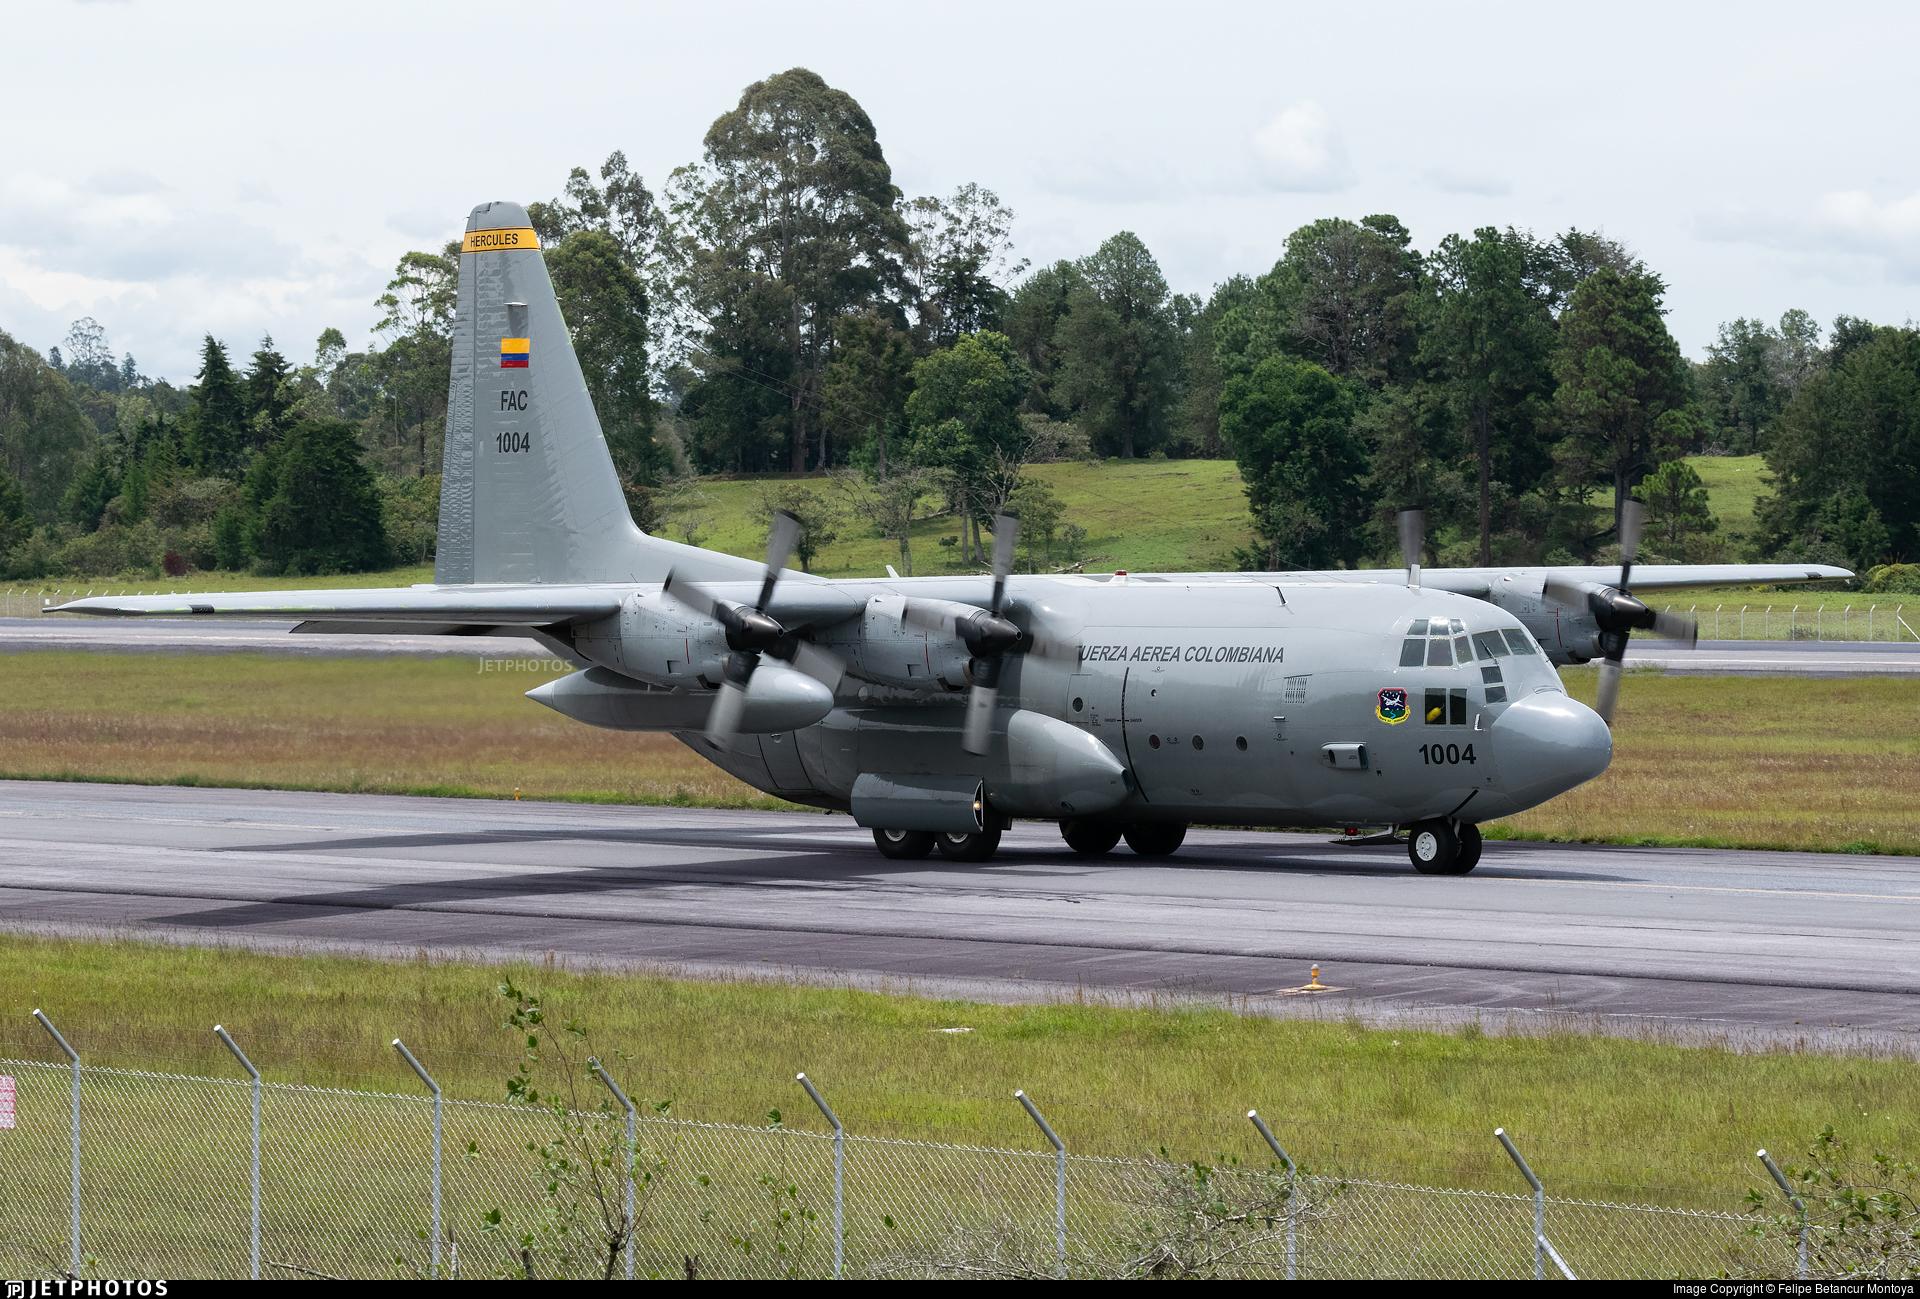 FAC1004 - Lockheed C-130H Hercules - Colombia - Air Force